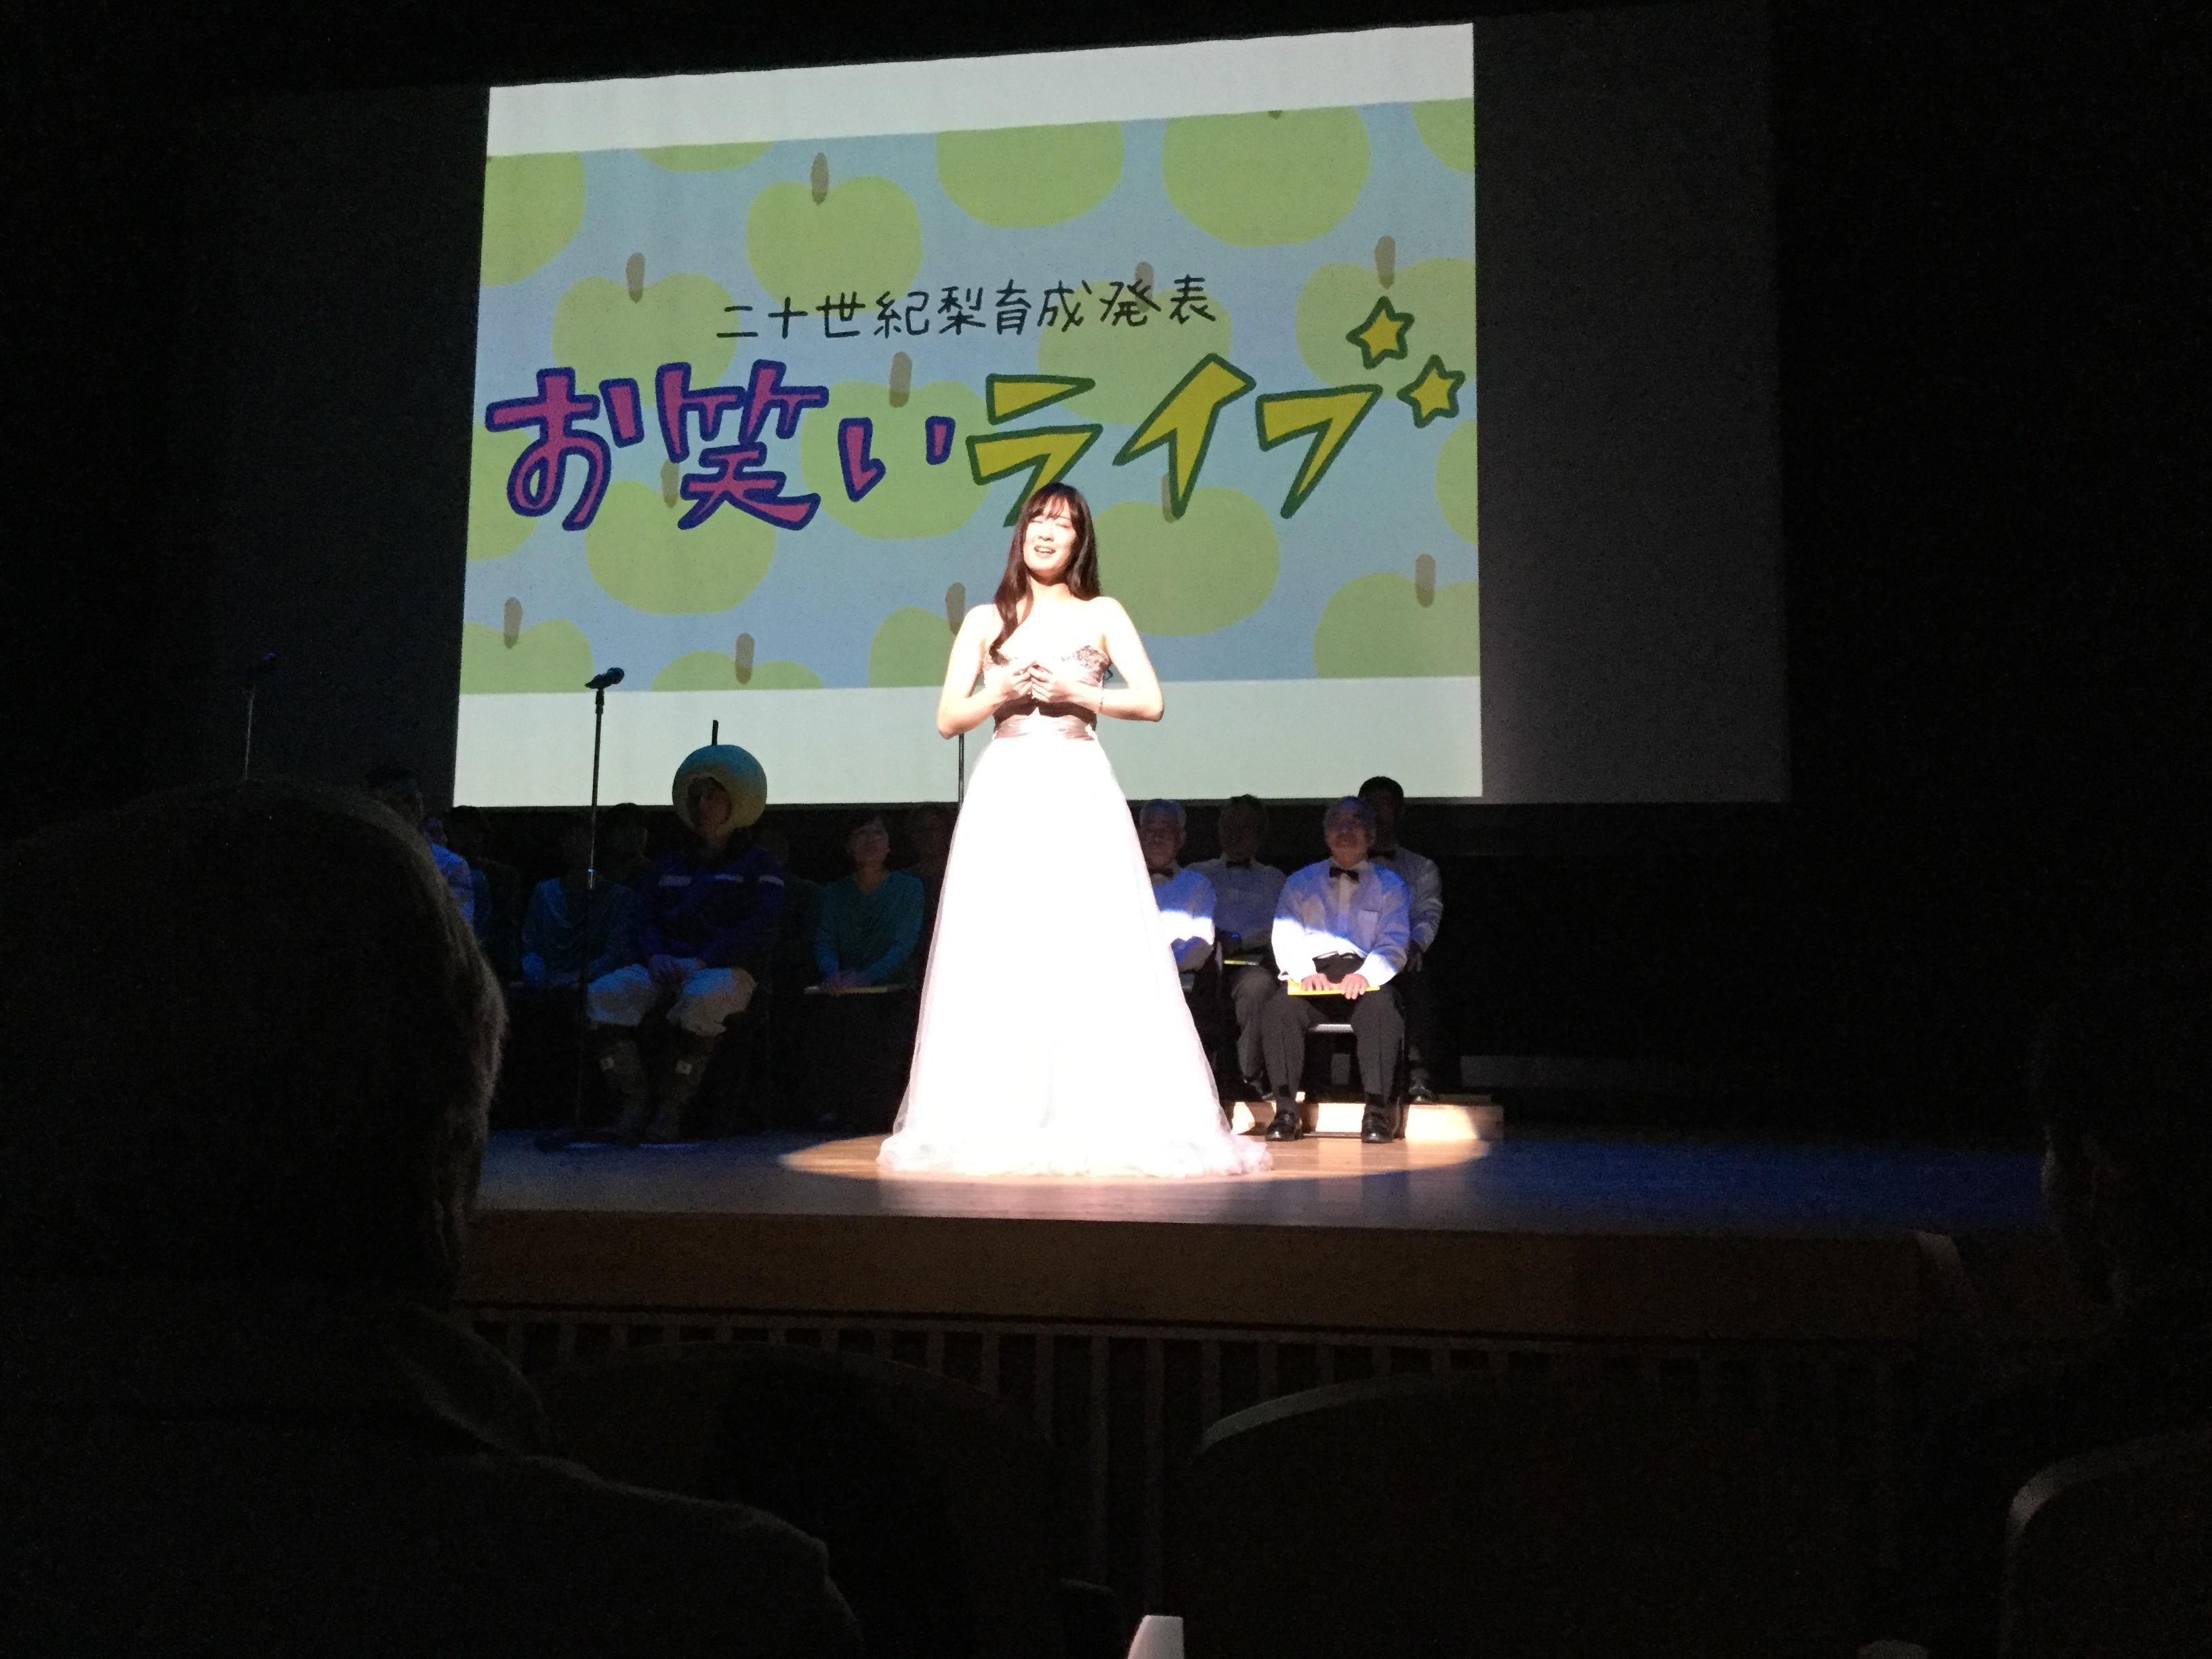 http://news.yoshimoto.co.jp/20180214202446-c627ca7e9e1cfcb4713f69167ad4206caa9a19f3.jpg